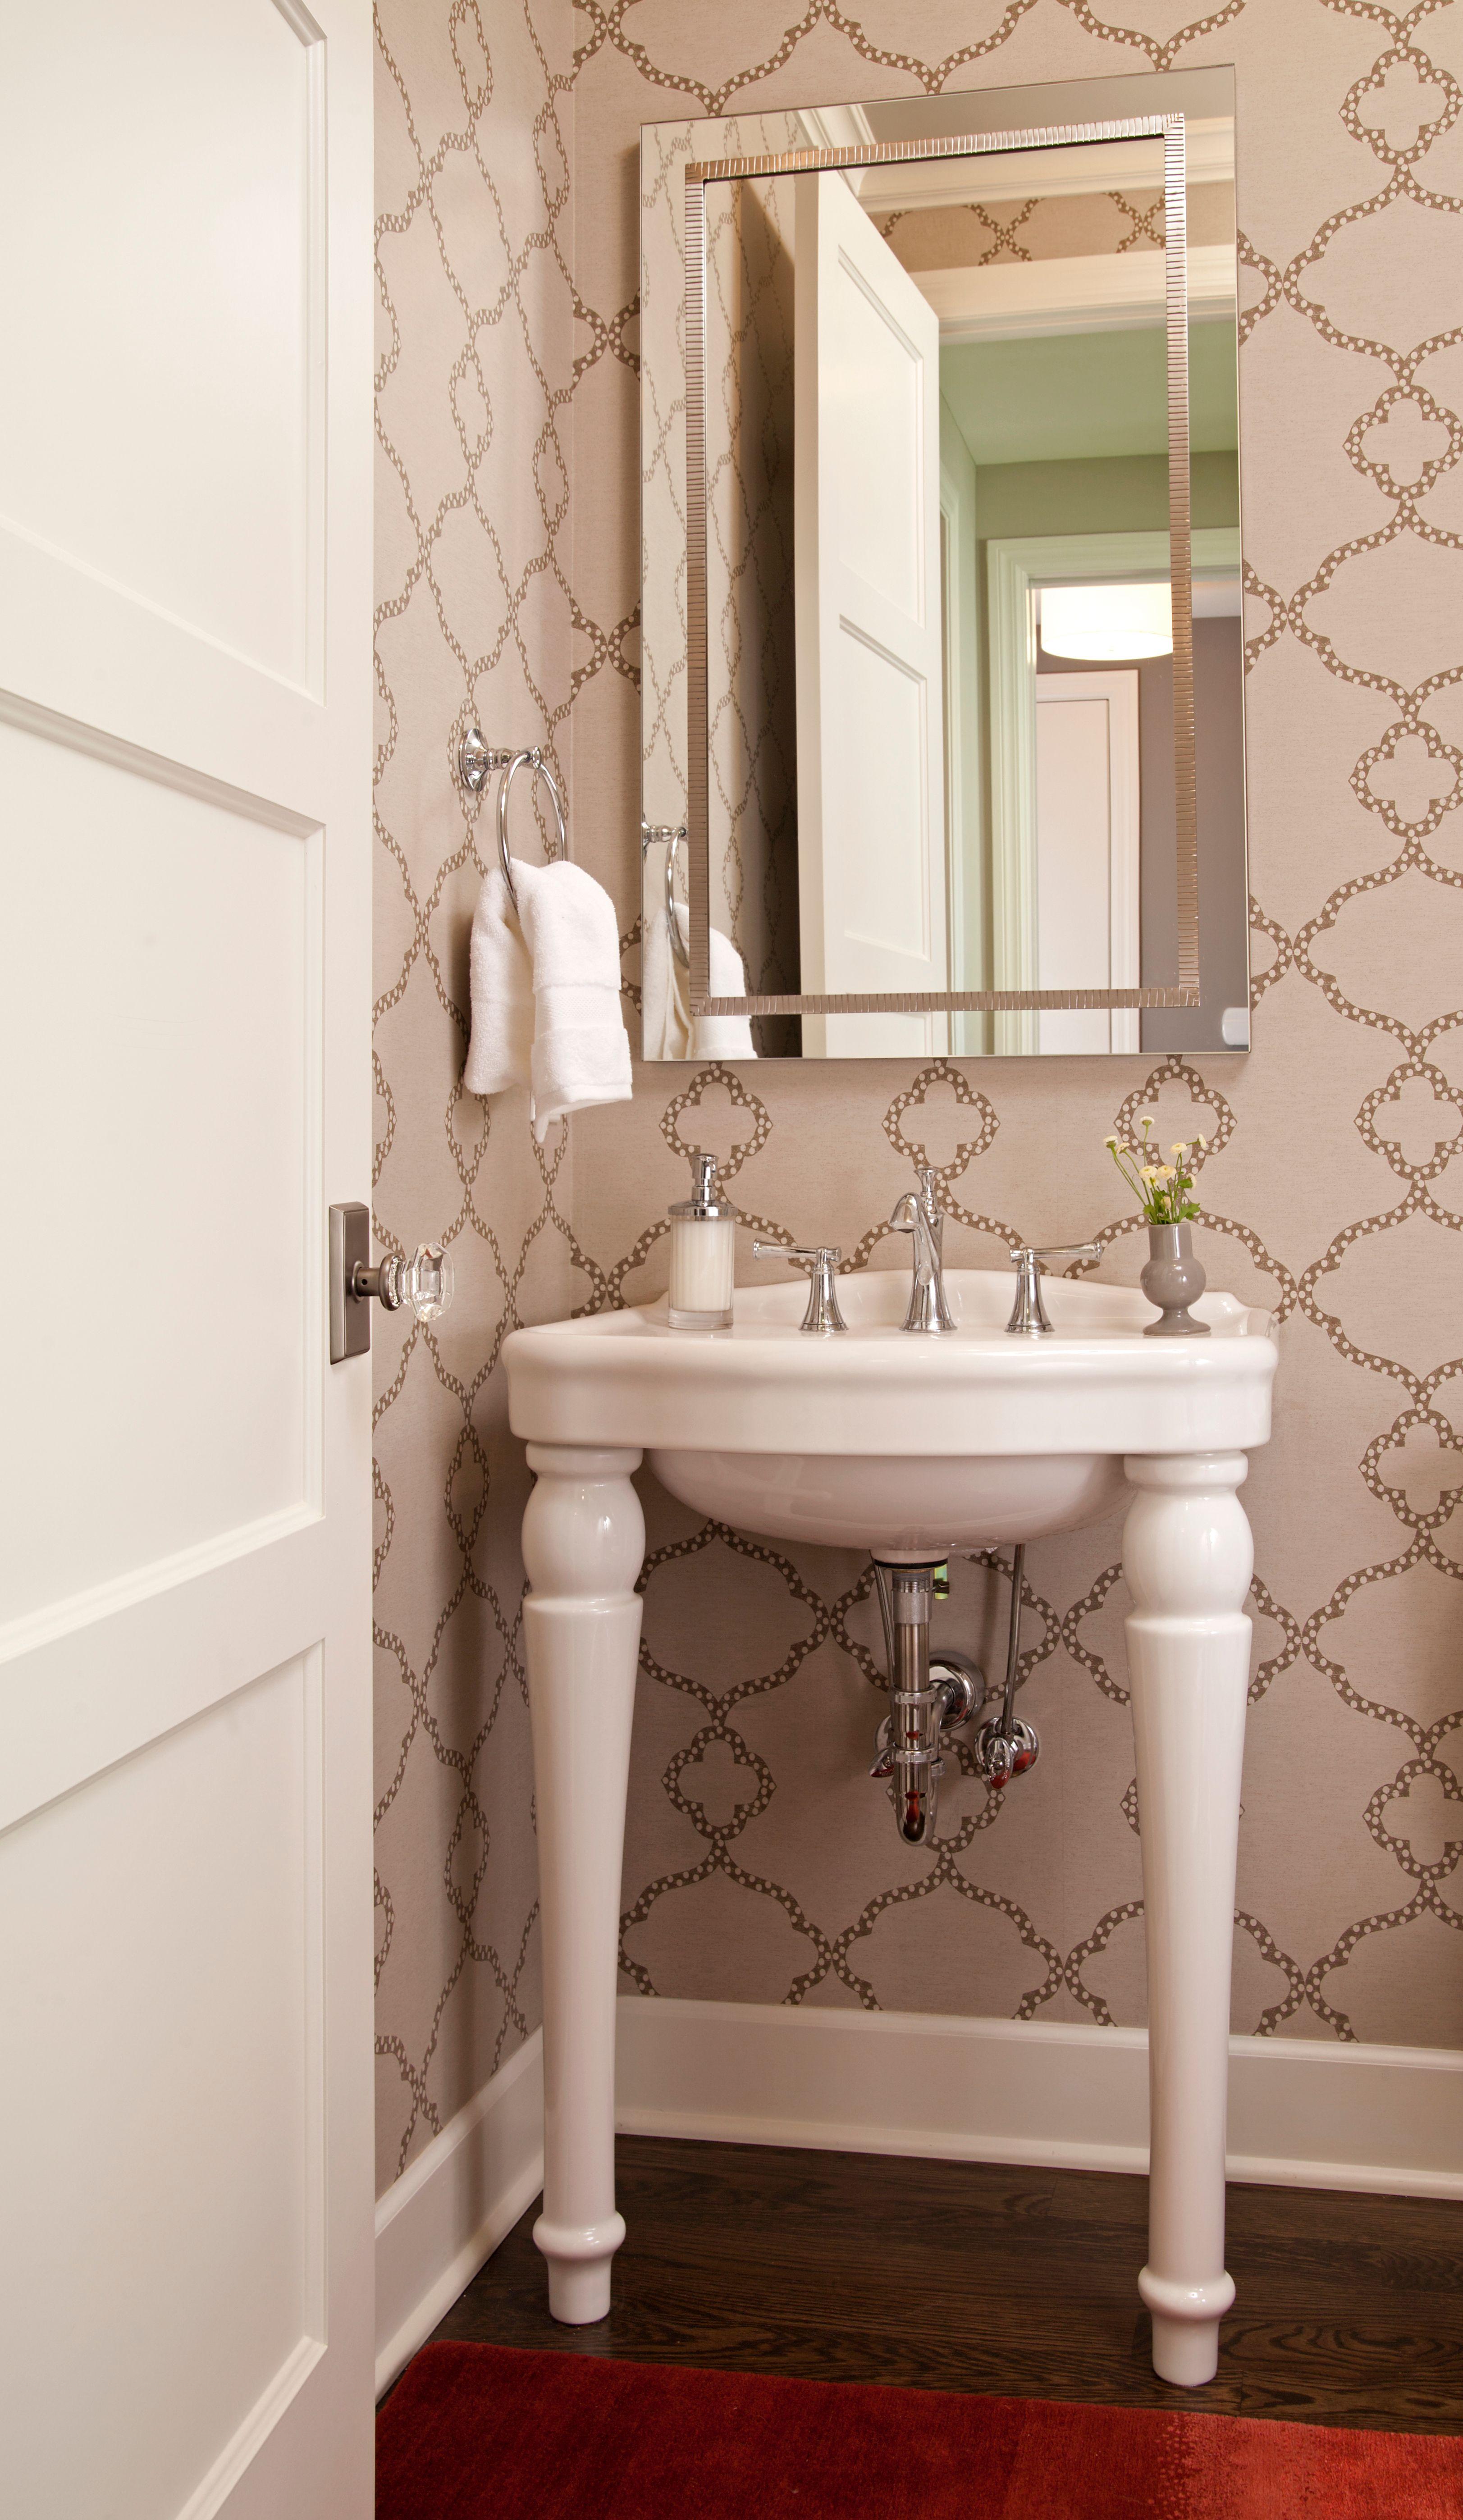 Bathroom vanities minneapolis - Small White Pedastool Type Bathroom Vanity With Bold Wallpaper And Double Beveled Mirror Designed